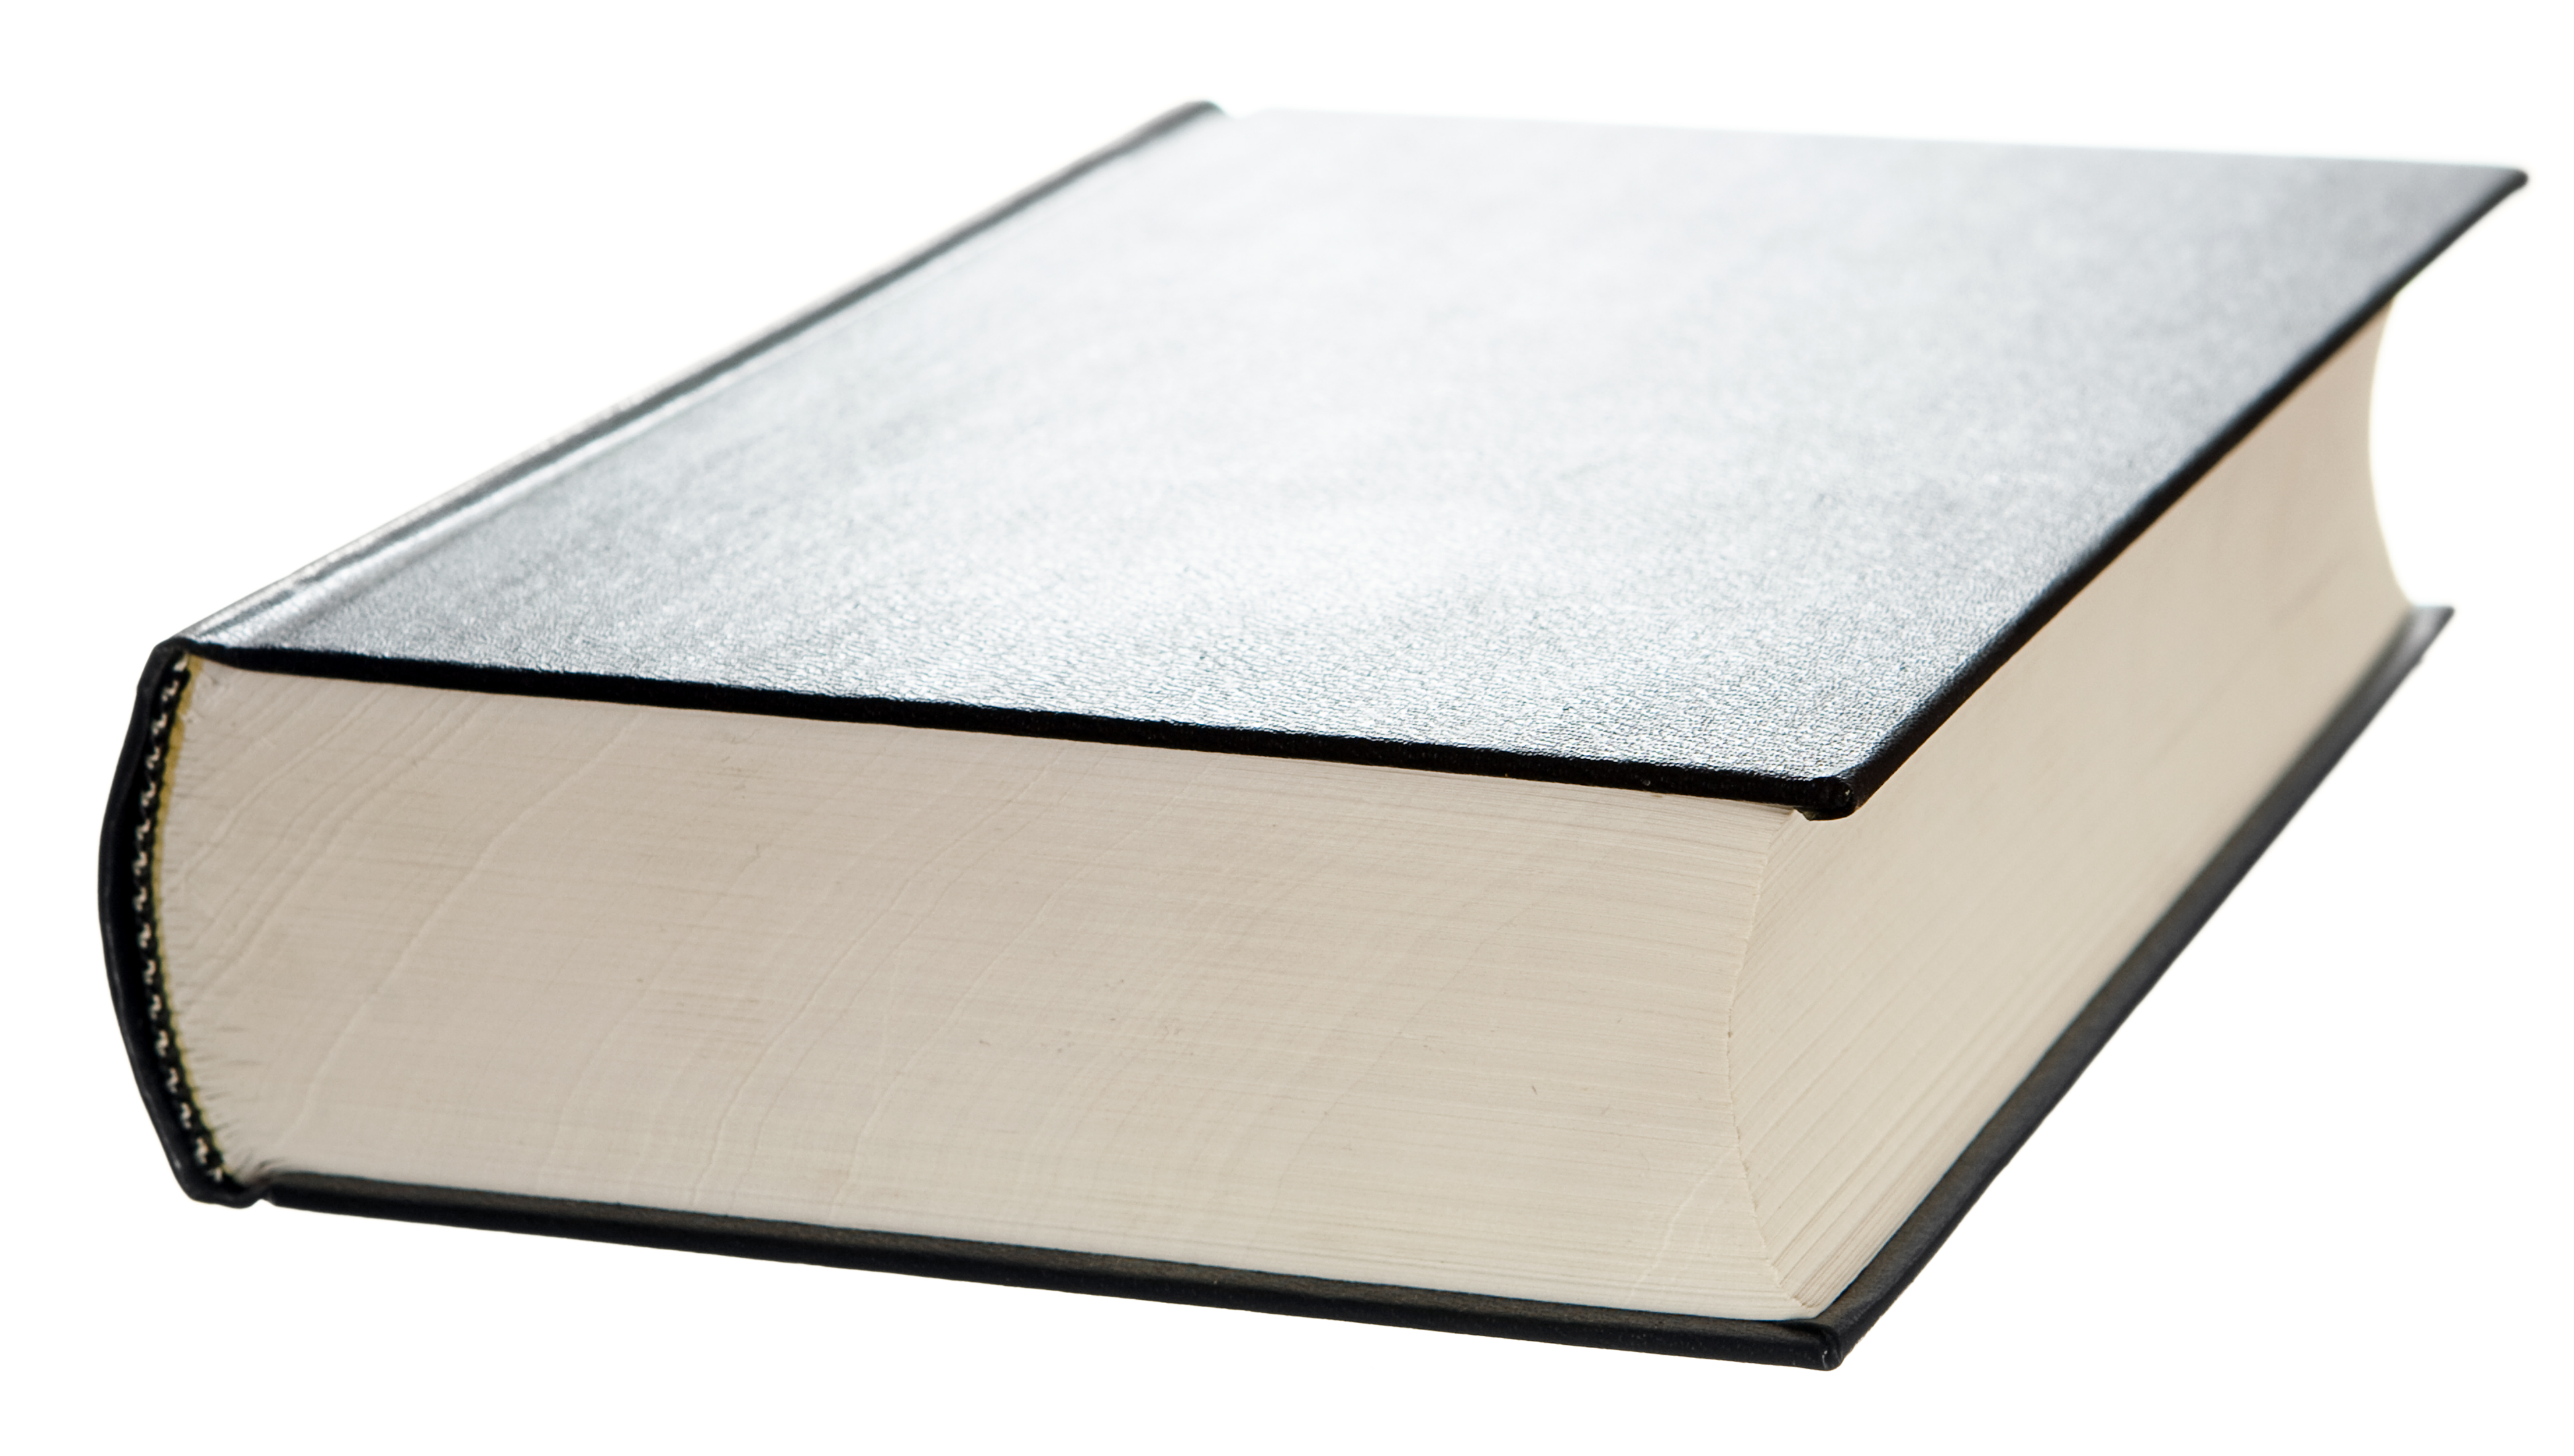 black book, Publication, Publisher, Read, Sample, HQ Photo